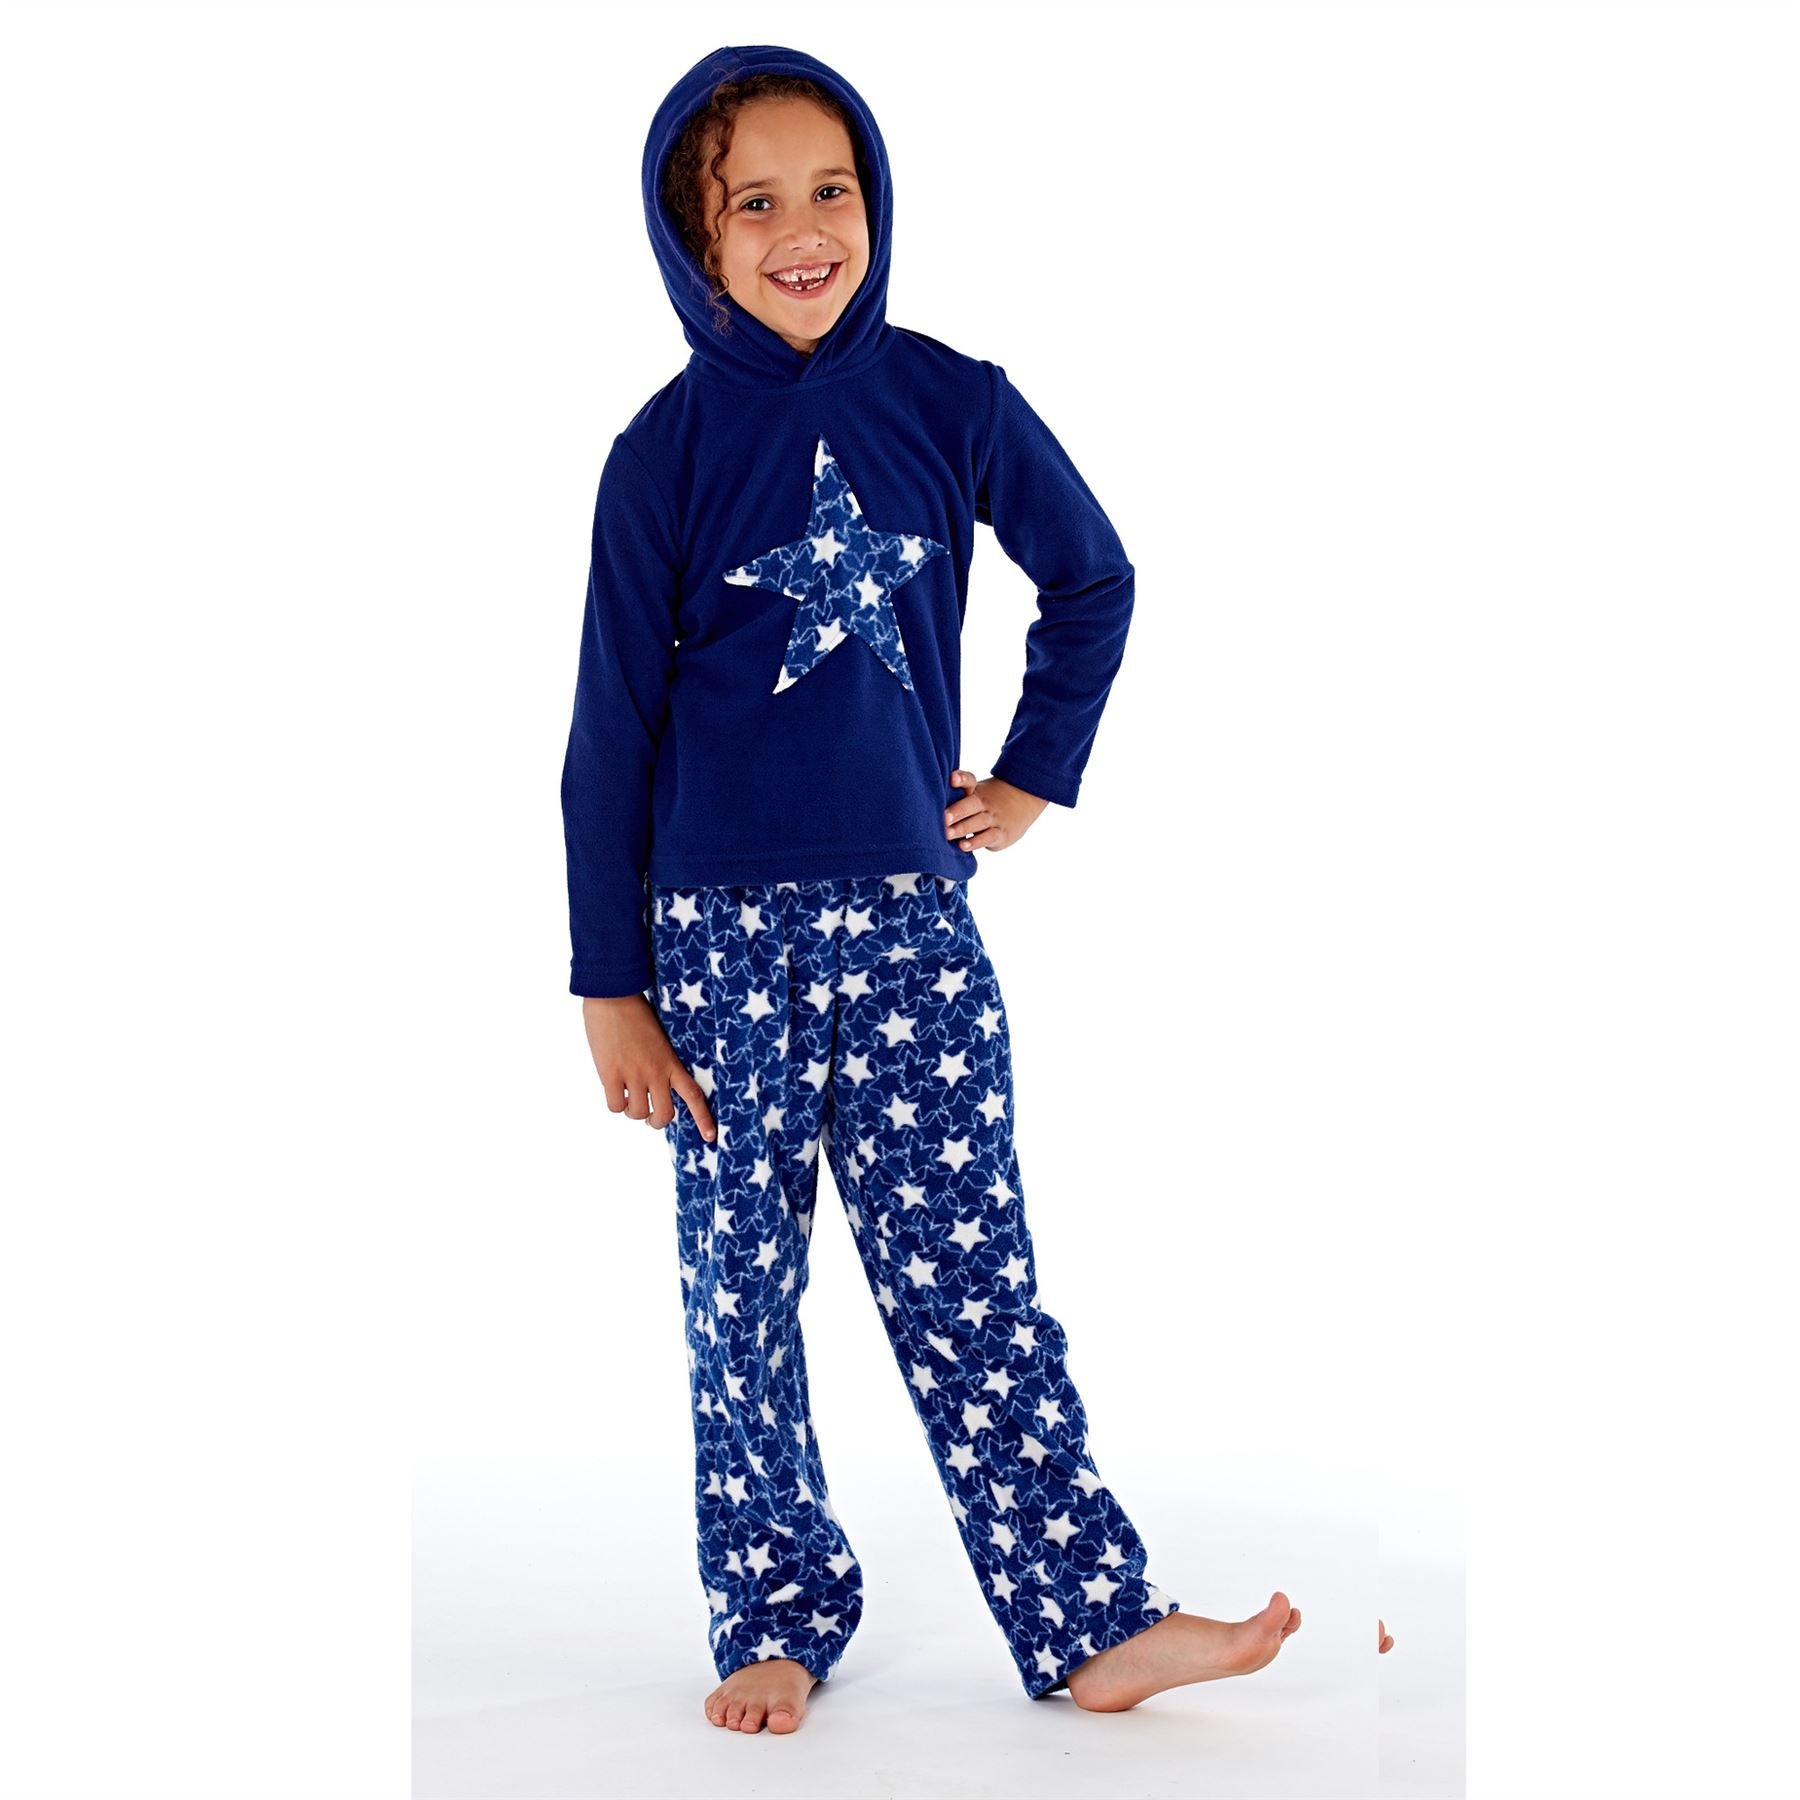 Girls-Boys-Fleece-Pyjamas-Childrens-Pyjama-Set-Kids-PJs-Age-2-13-Years thumbnail 31